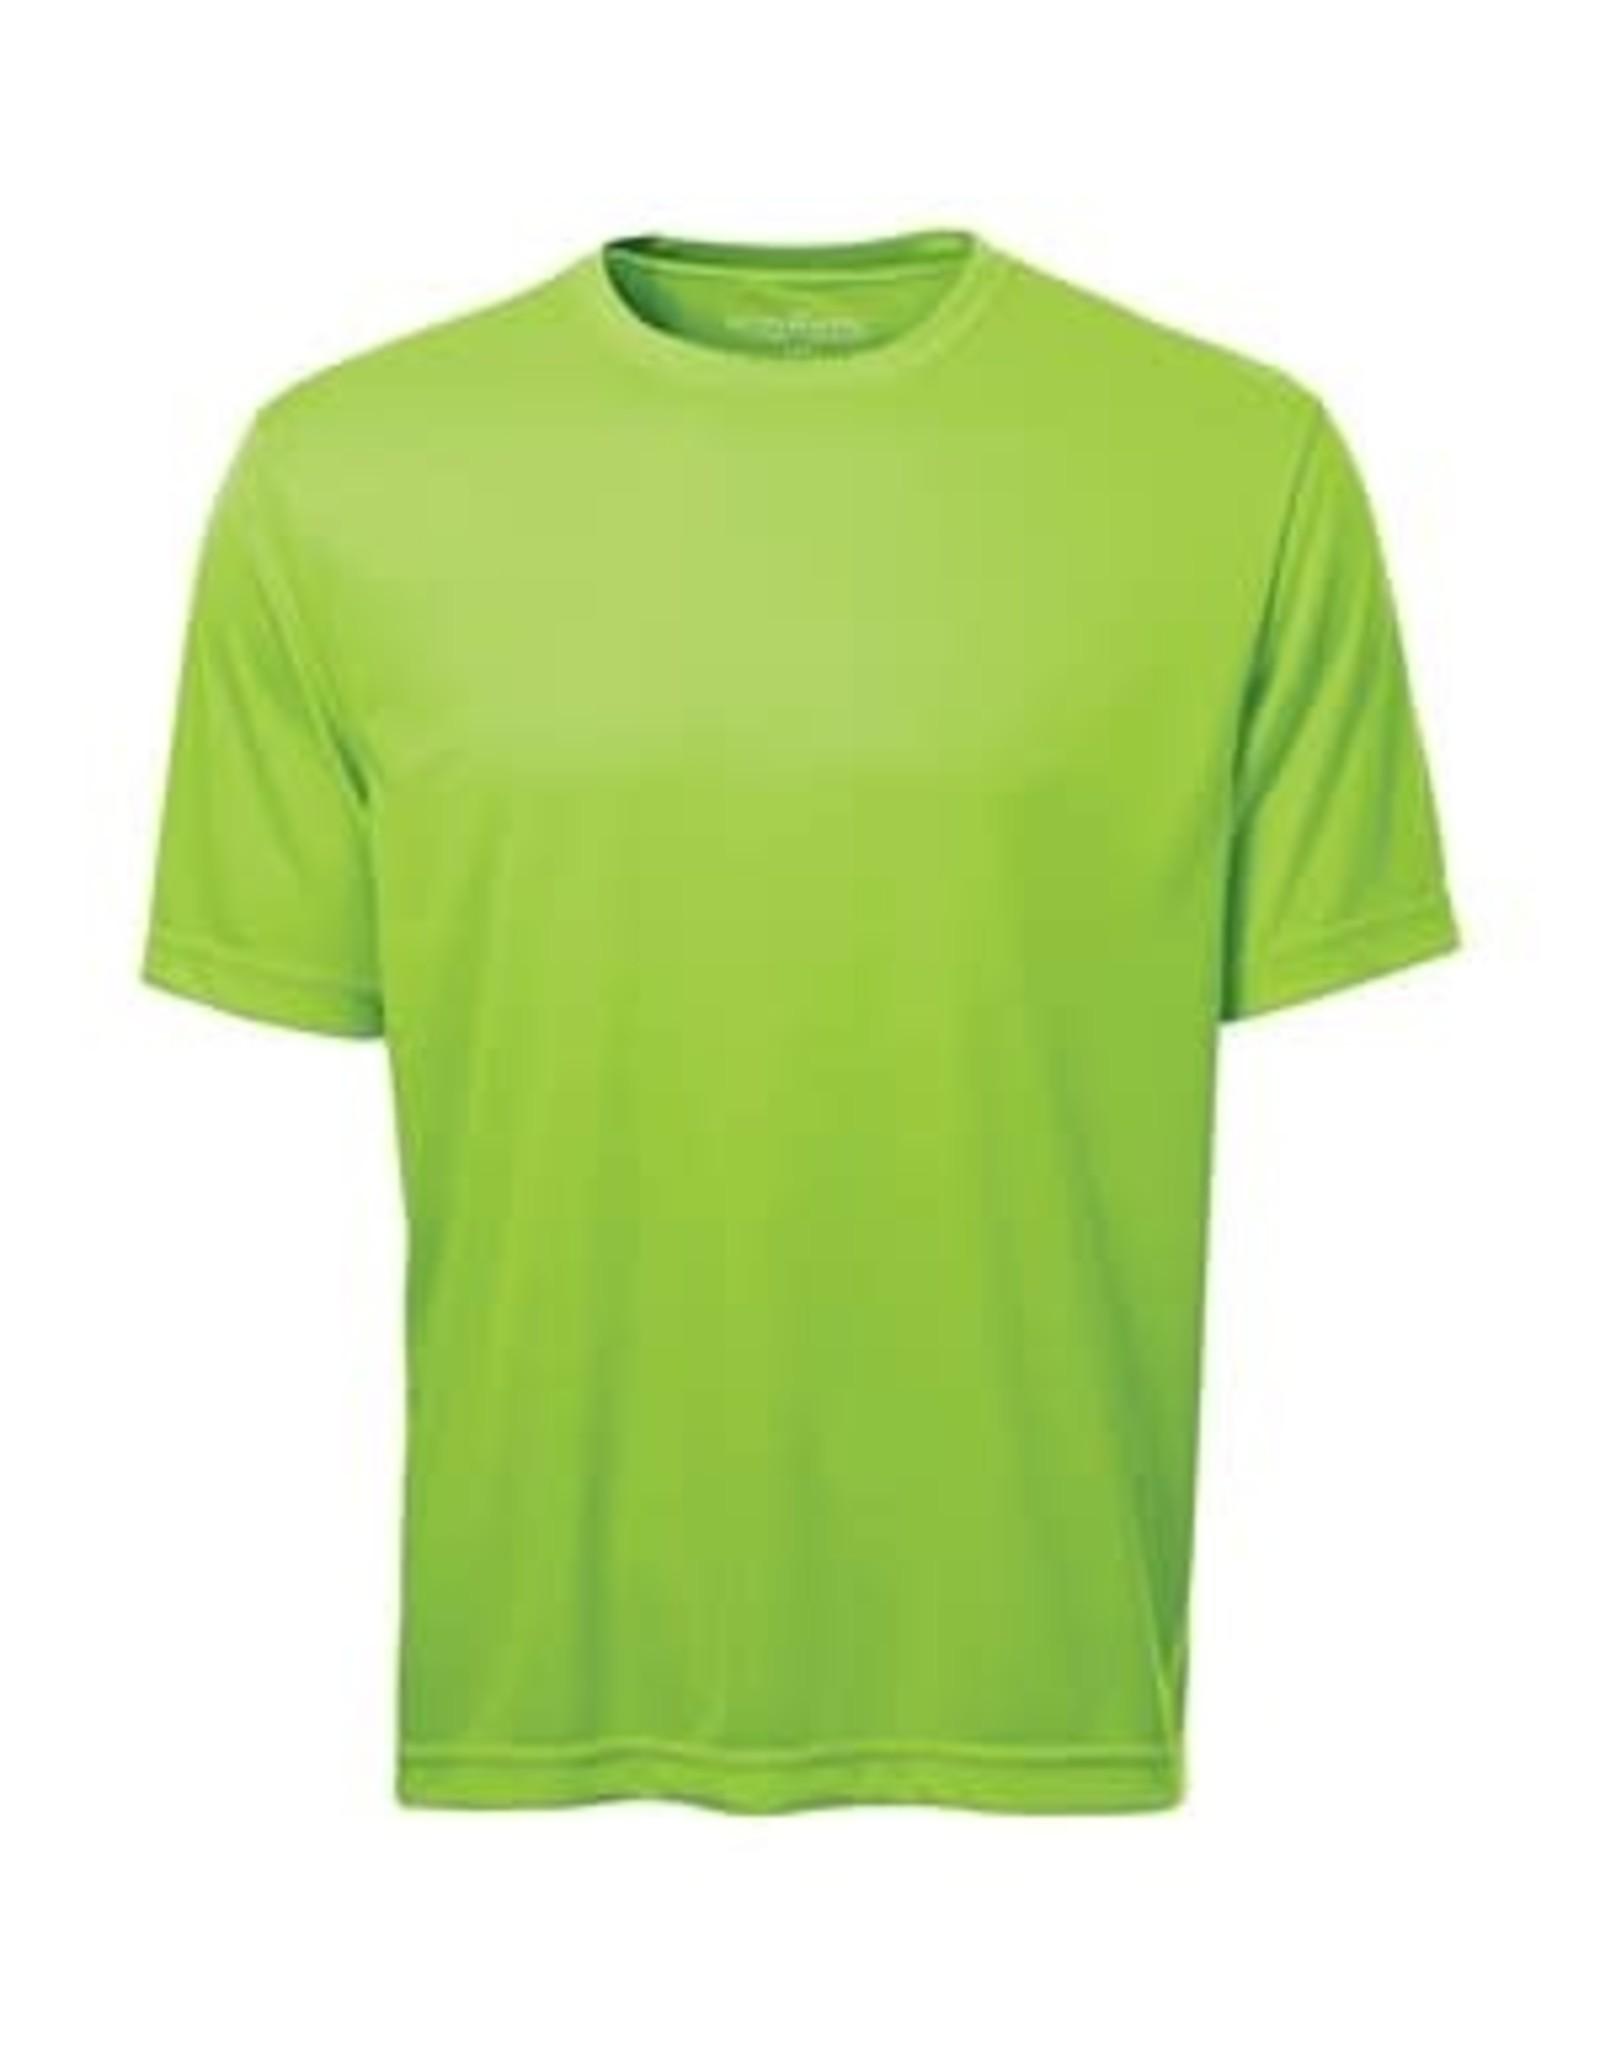 Adult Performance T-shirt - S350